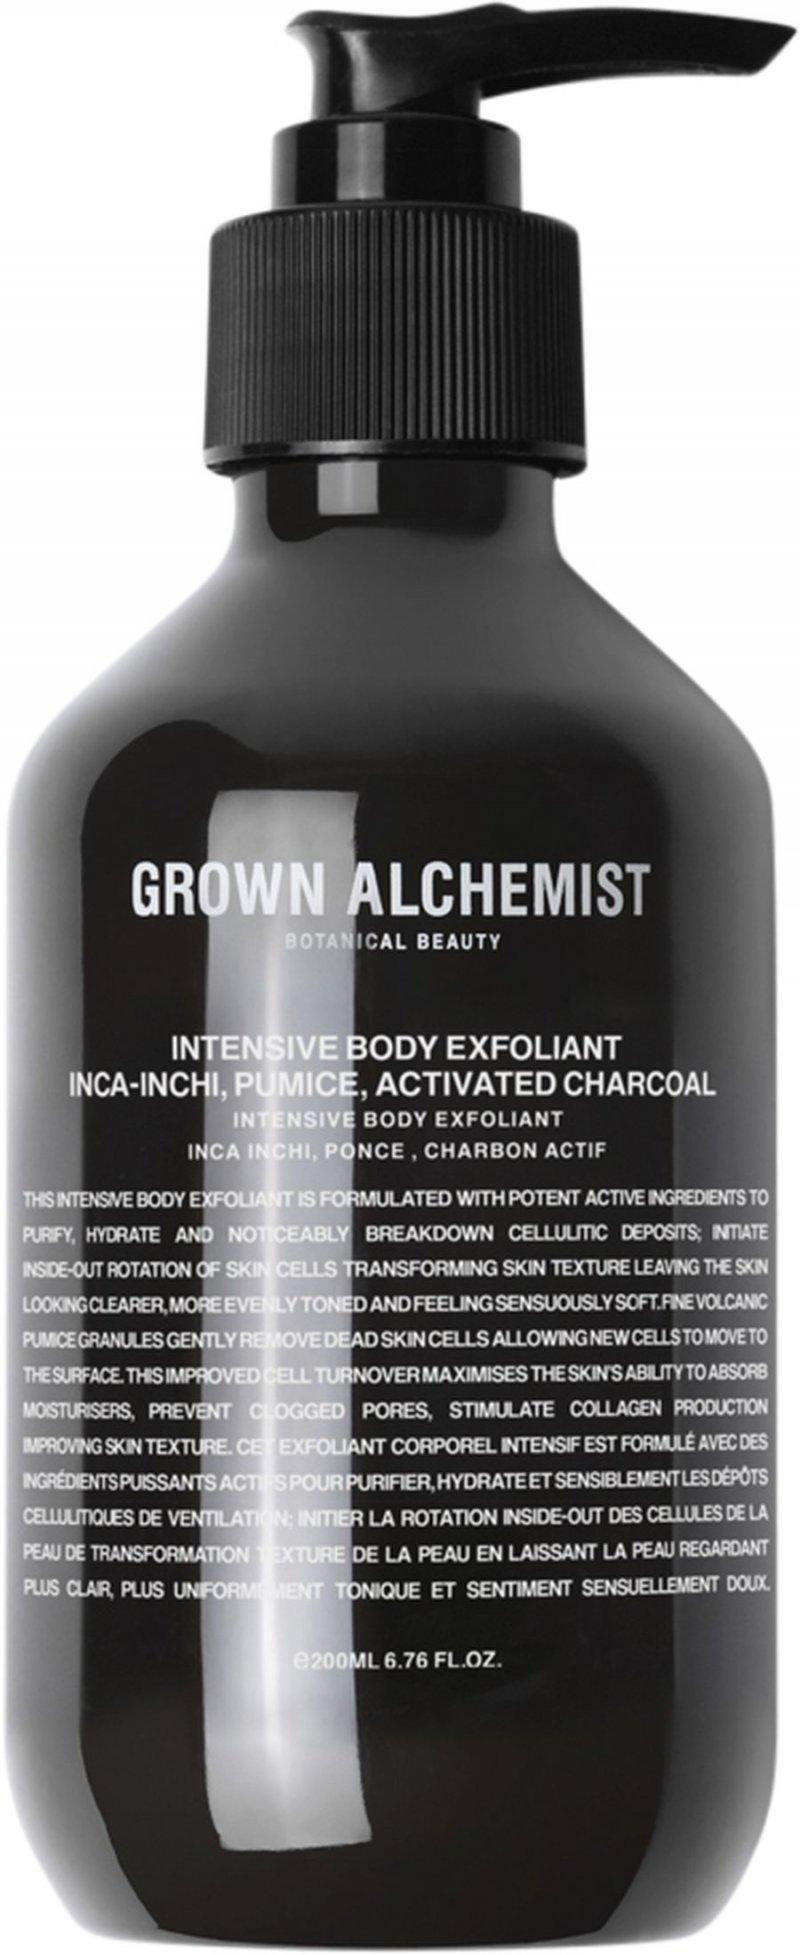 Image of   Grown Alchemist Kropsbehandling - Intensive Body Exfoliant Inca-inchi, Pumice 200 Ml